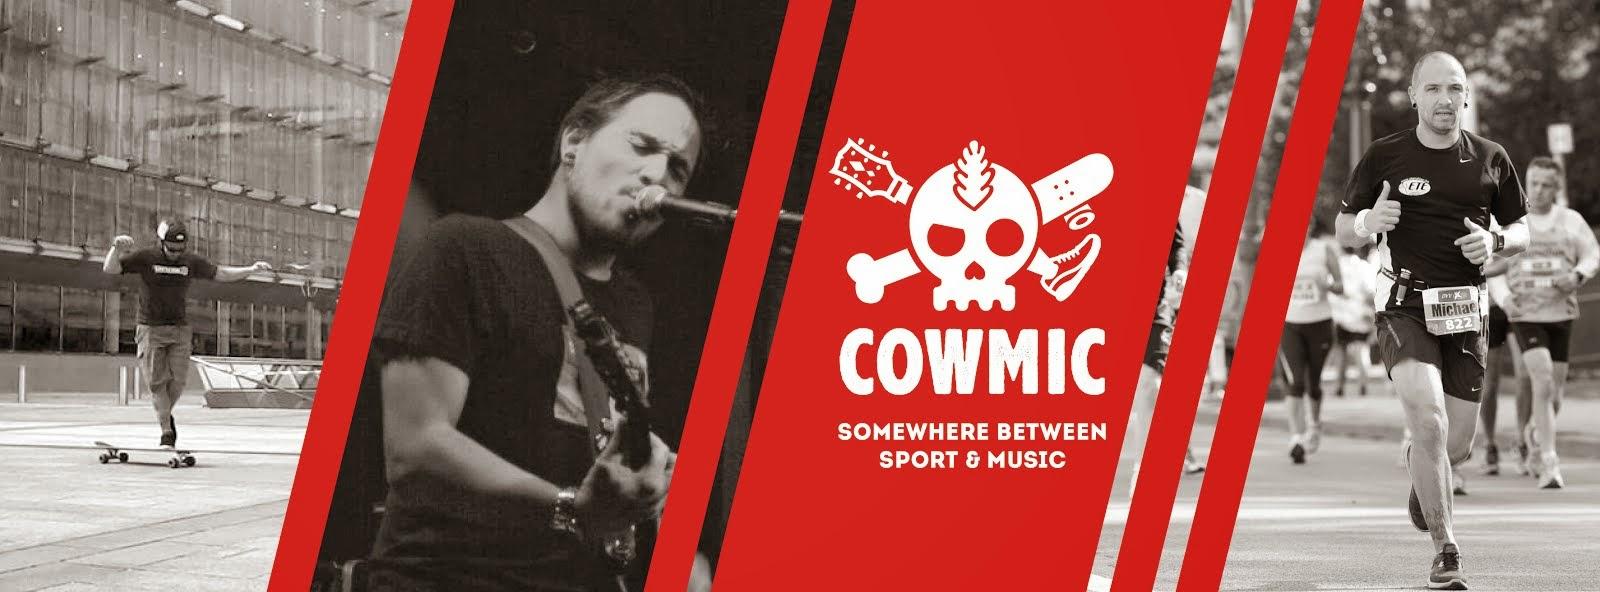 Cowmic - Between Sport & Music